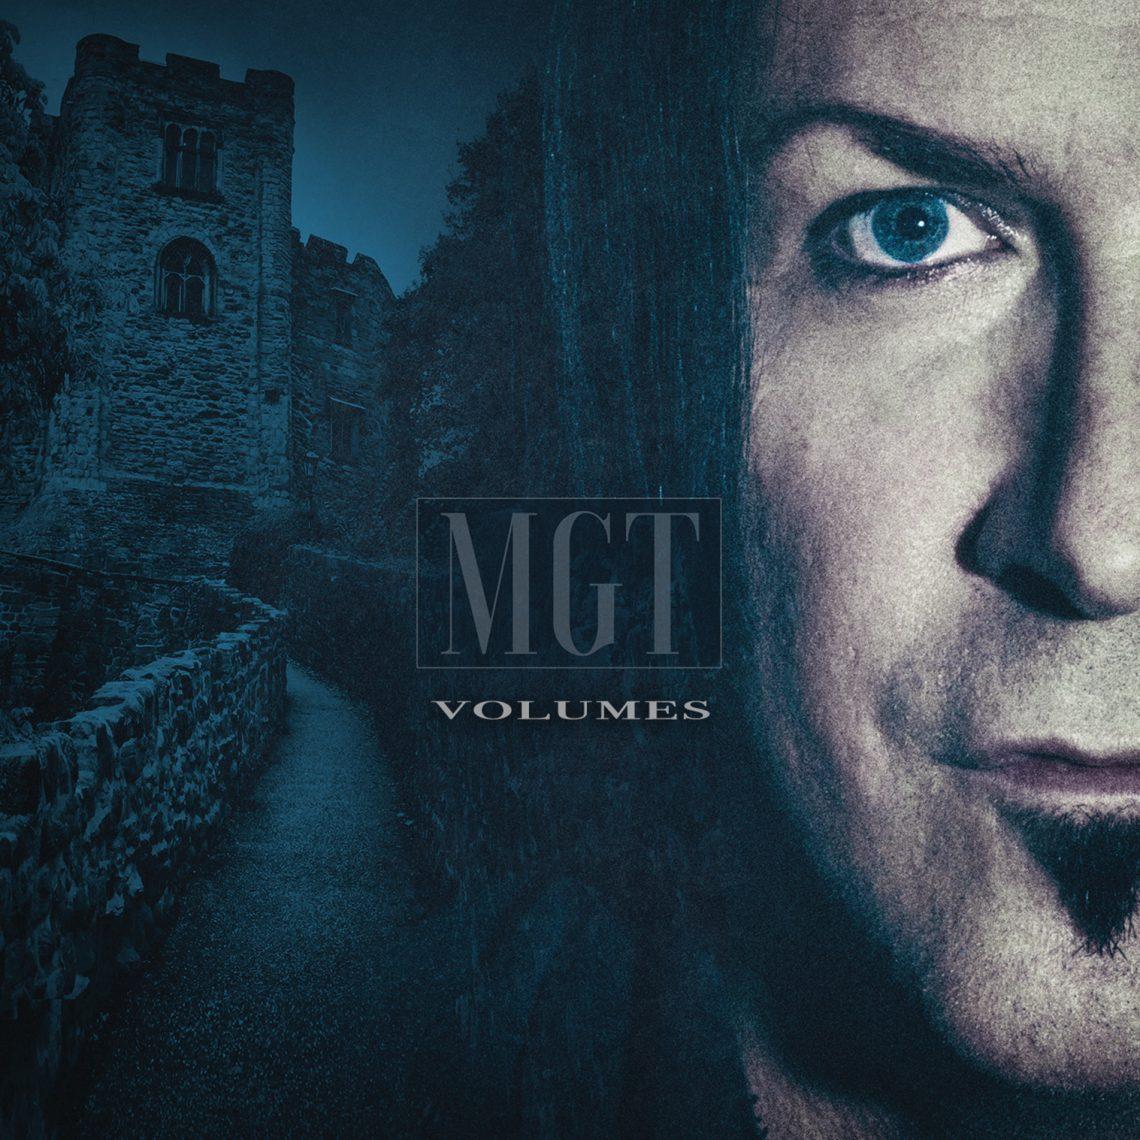 MARK GEMINI THWAITE – Volumes CD Review